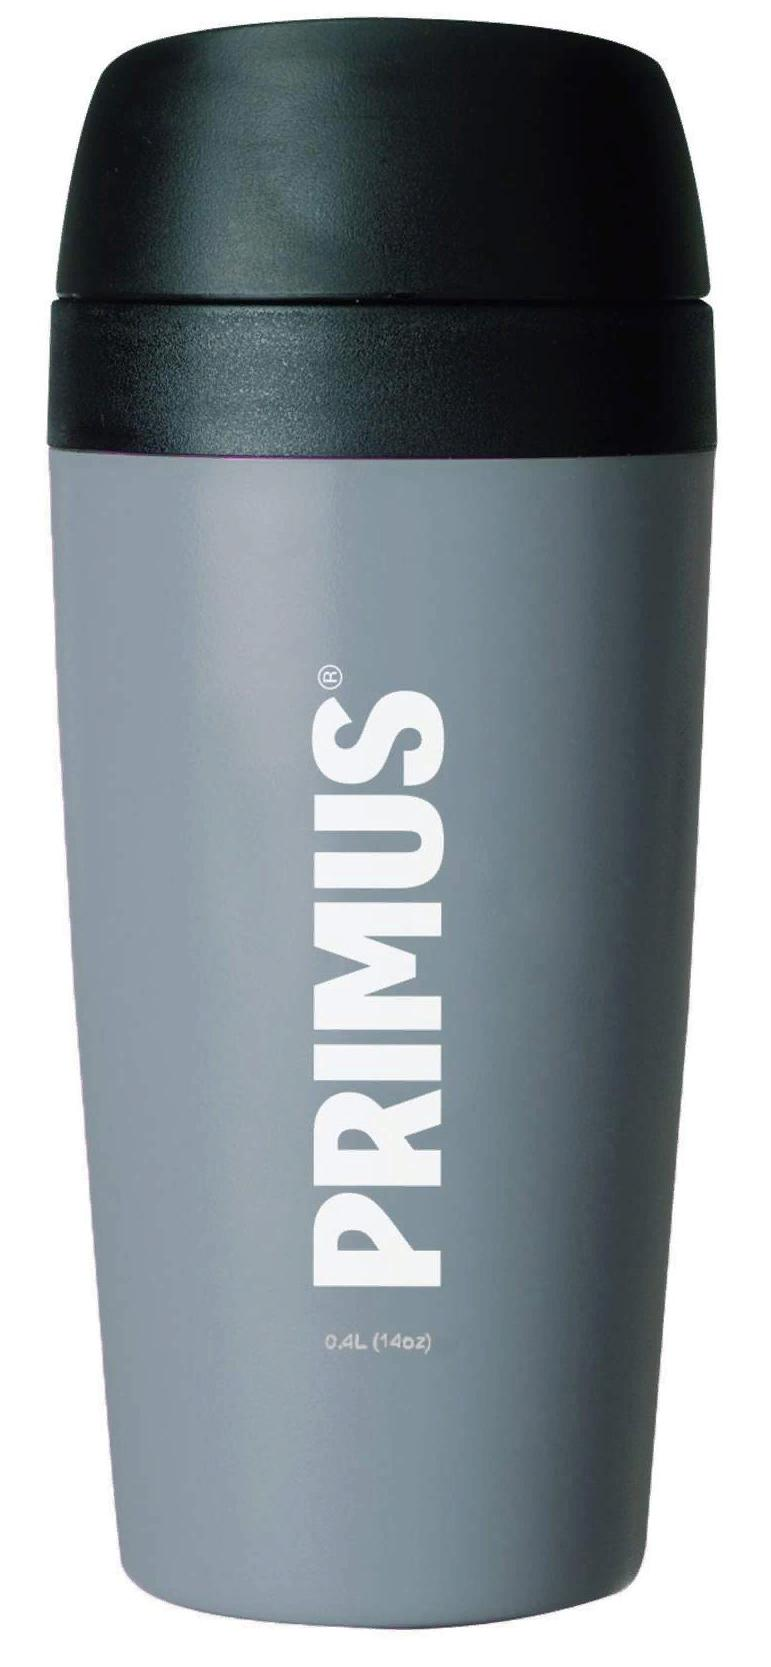 Термокружка Primus Commuter mug 0.4 Concrete Gray, Посуда - арт. 1044120196